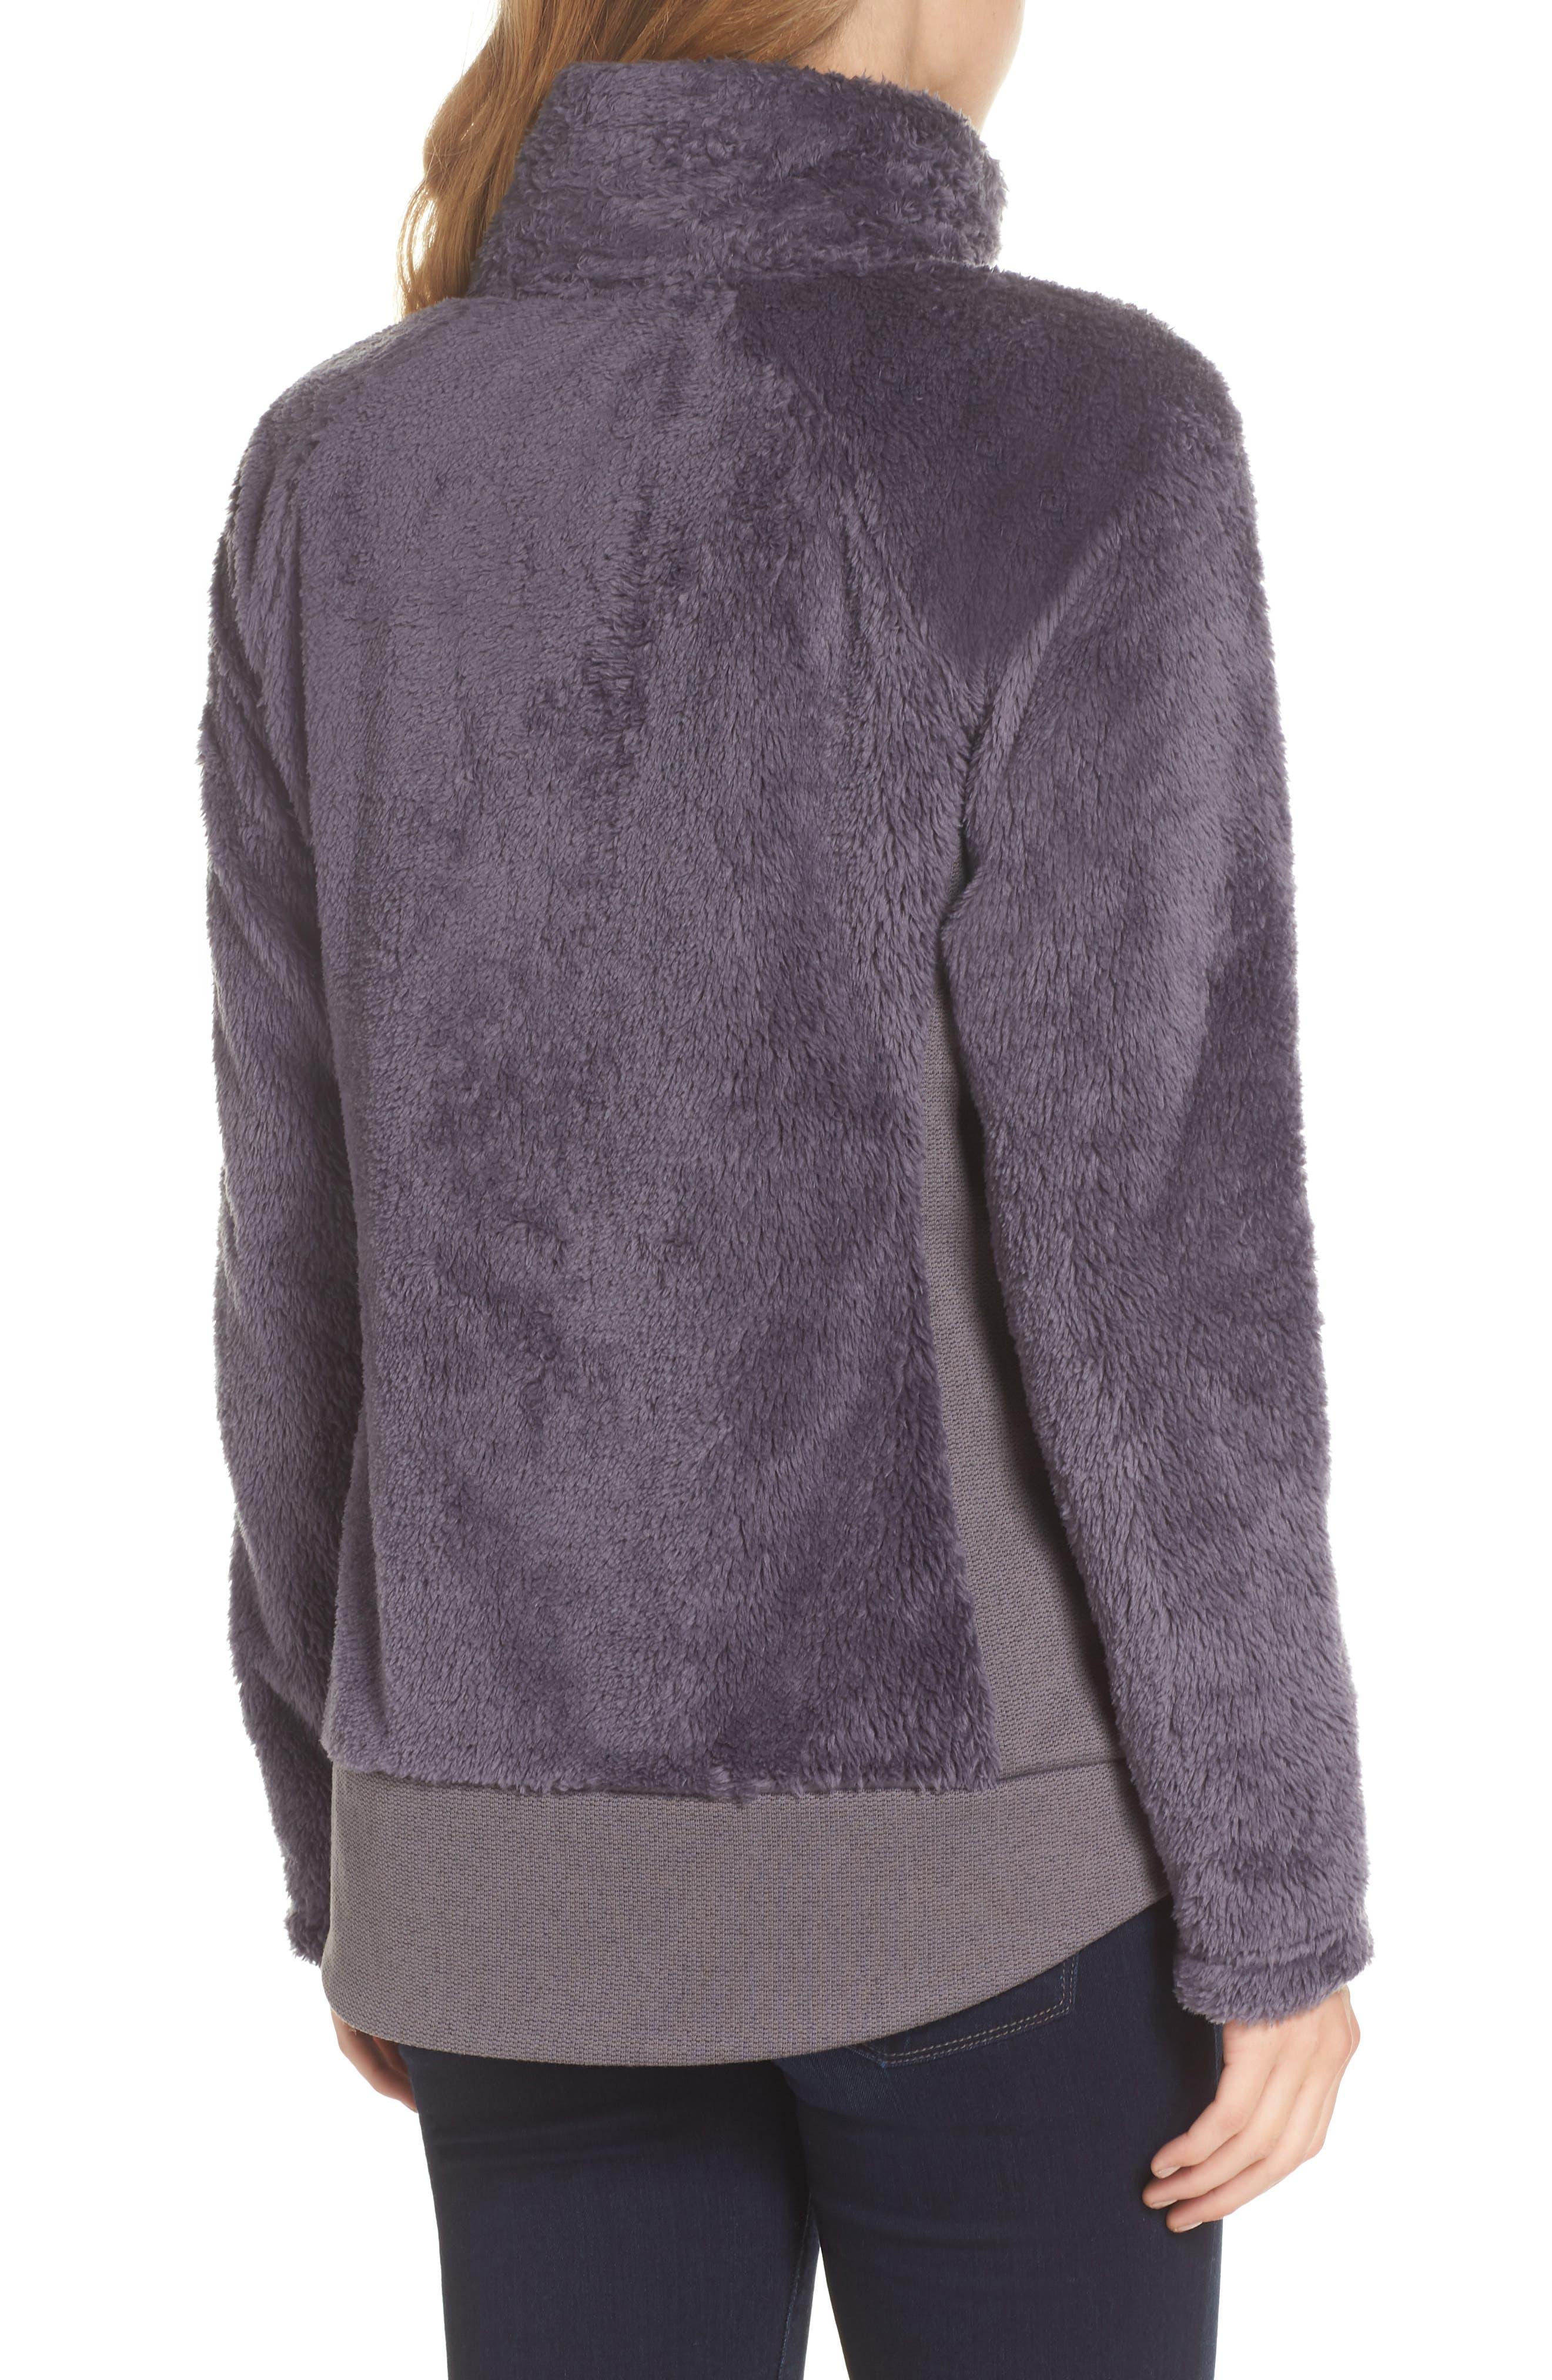 Furry Fleece Jacket,                             Alternate thumbnail 2, color,                             021